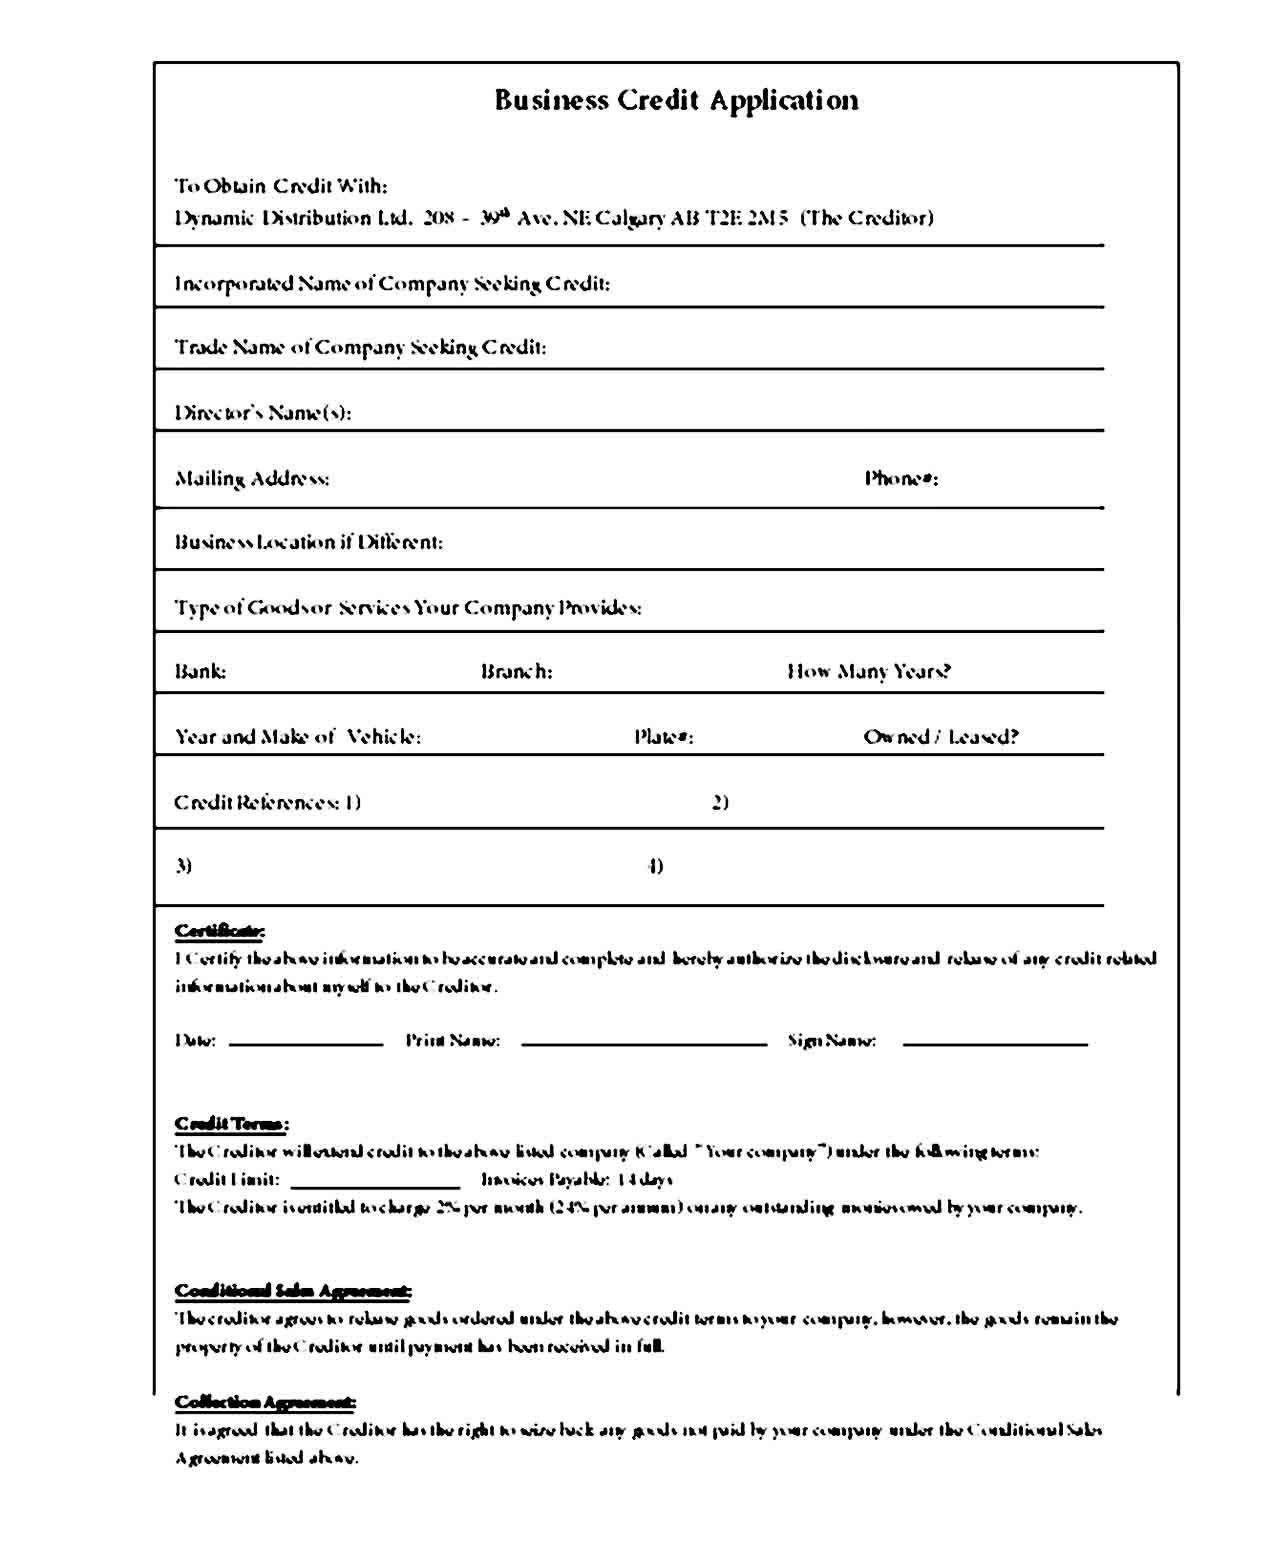 Sample Credit Application Template Credit Applications Application Letter Template Business Template Sample of credit application form